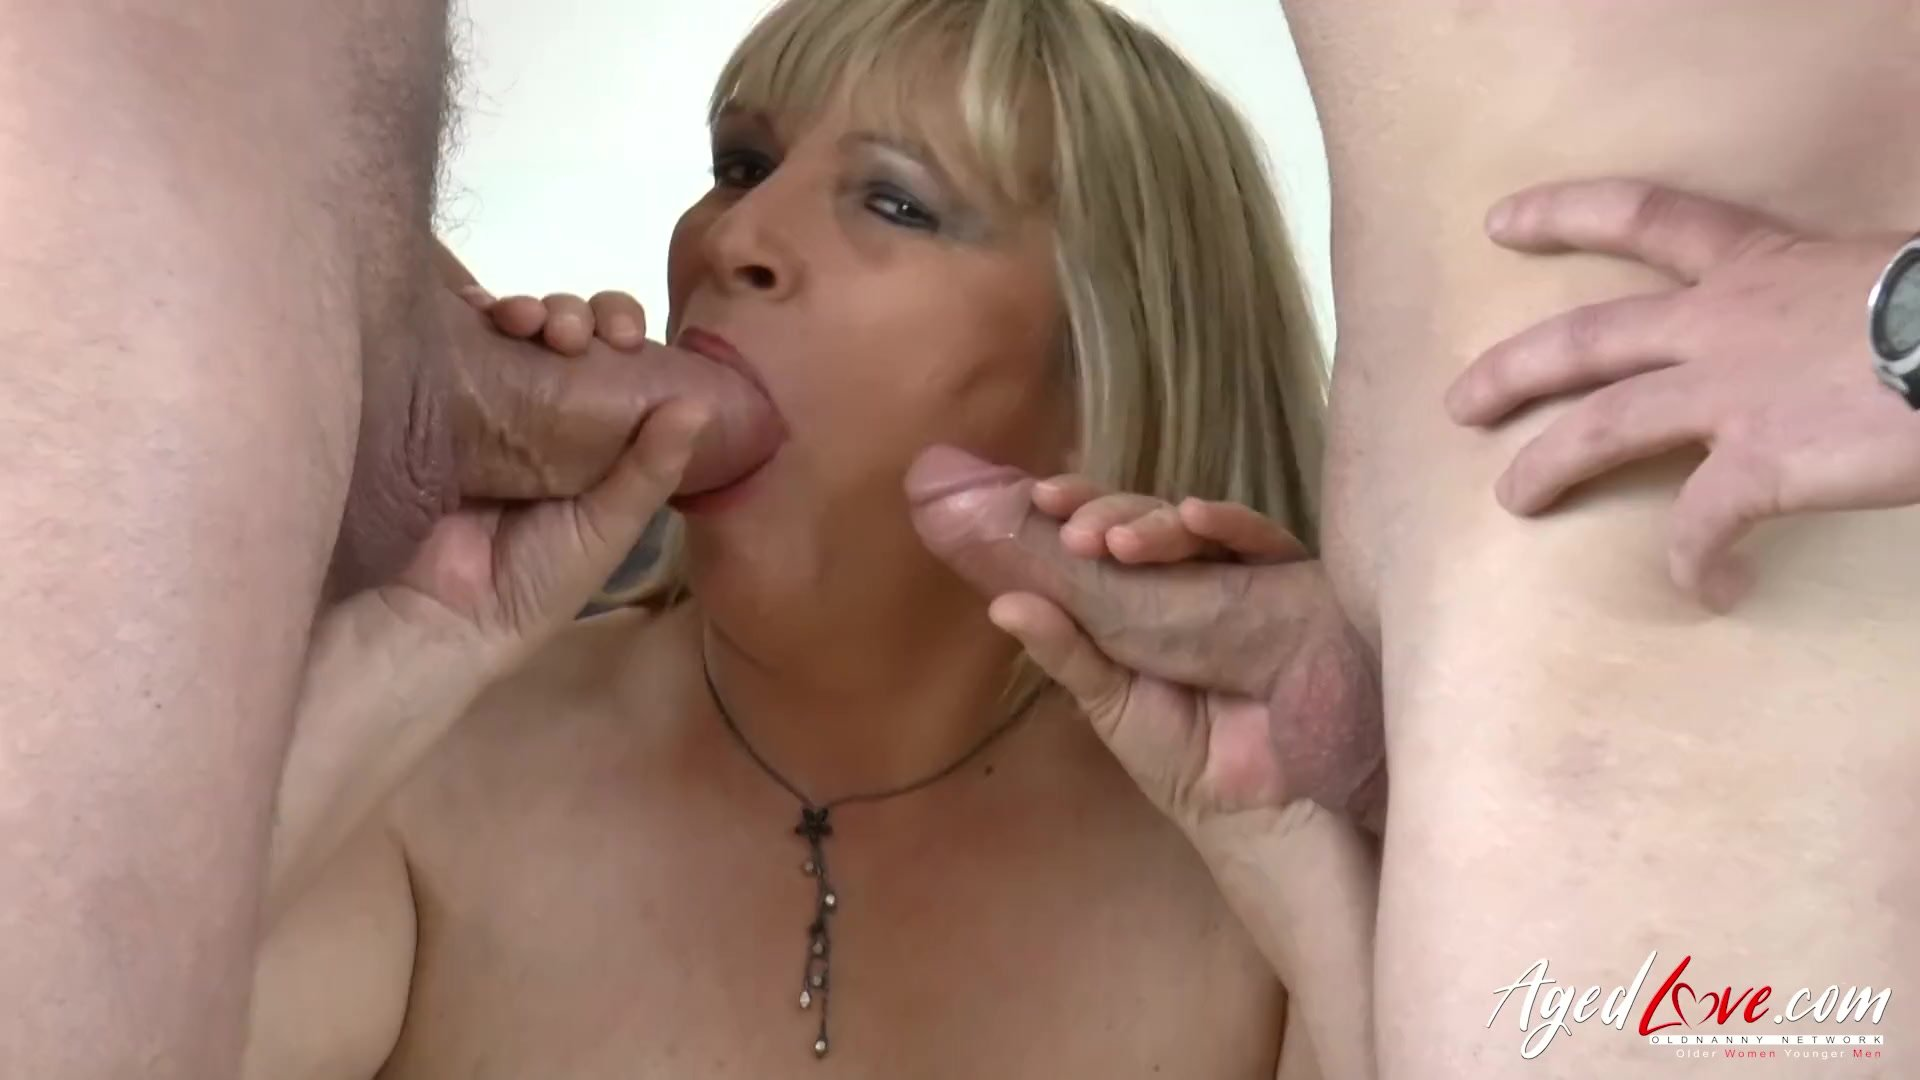 AgedLovE Threesome Mature Hardcore Action